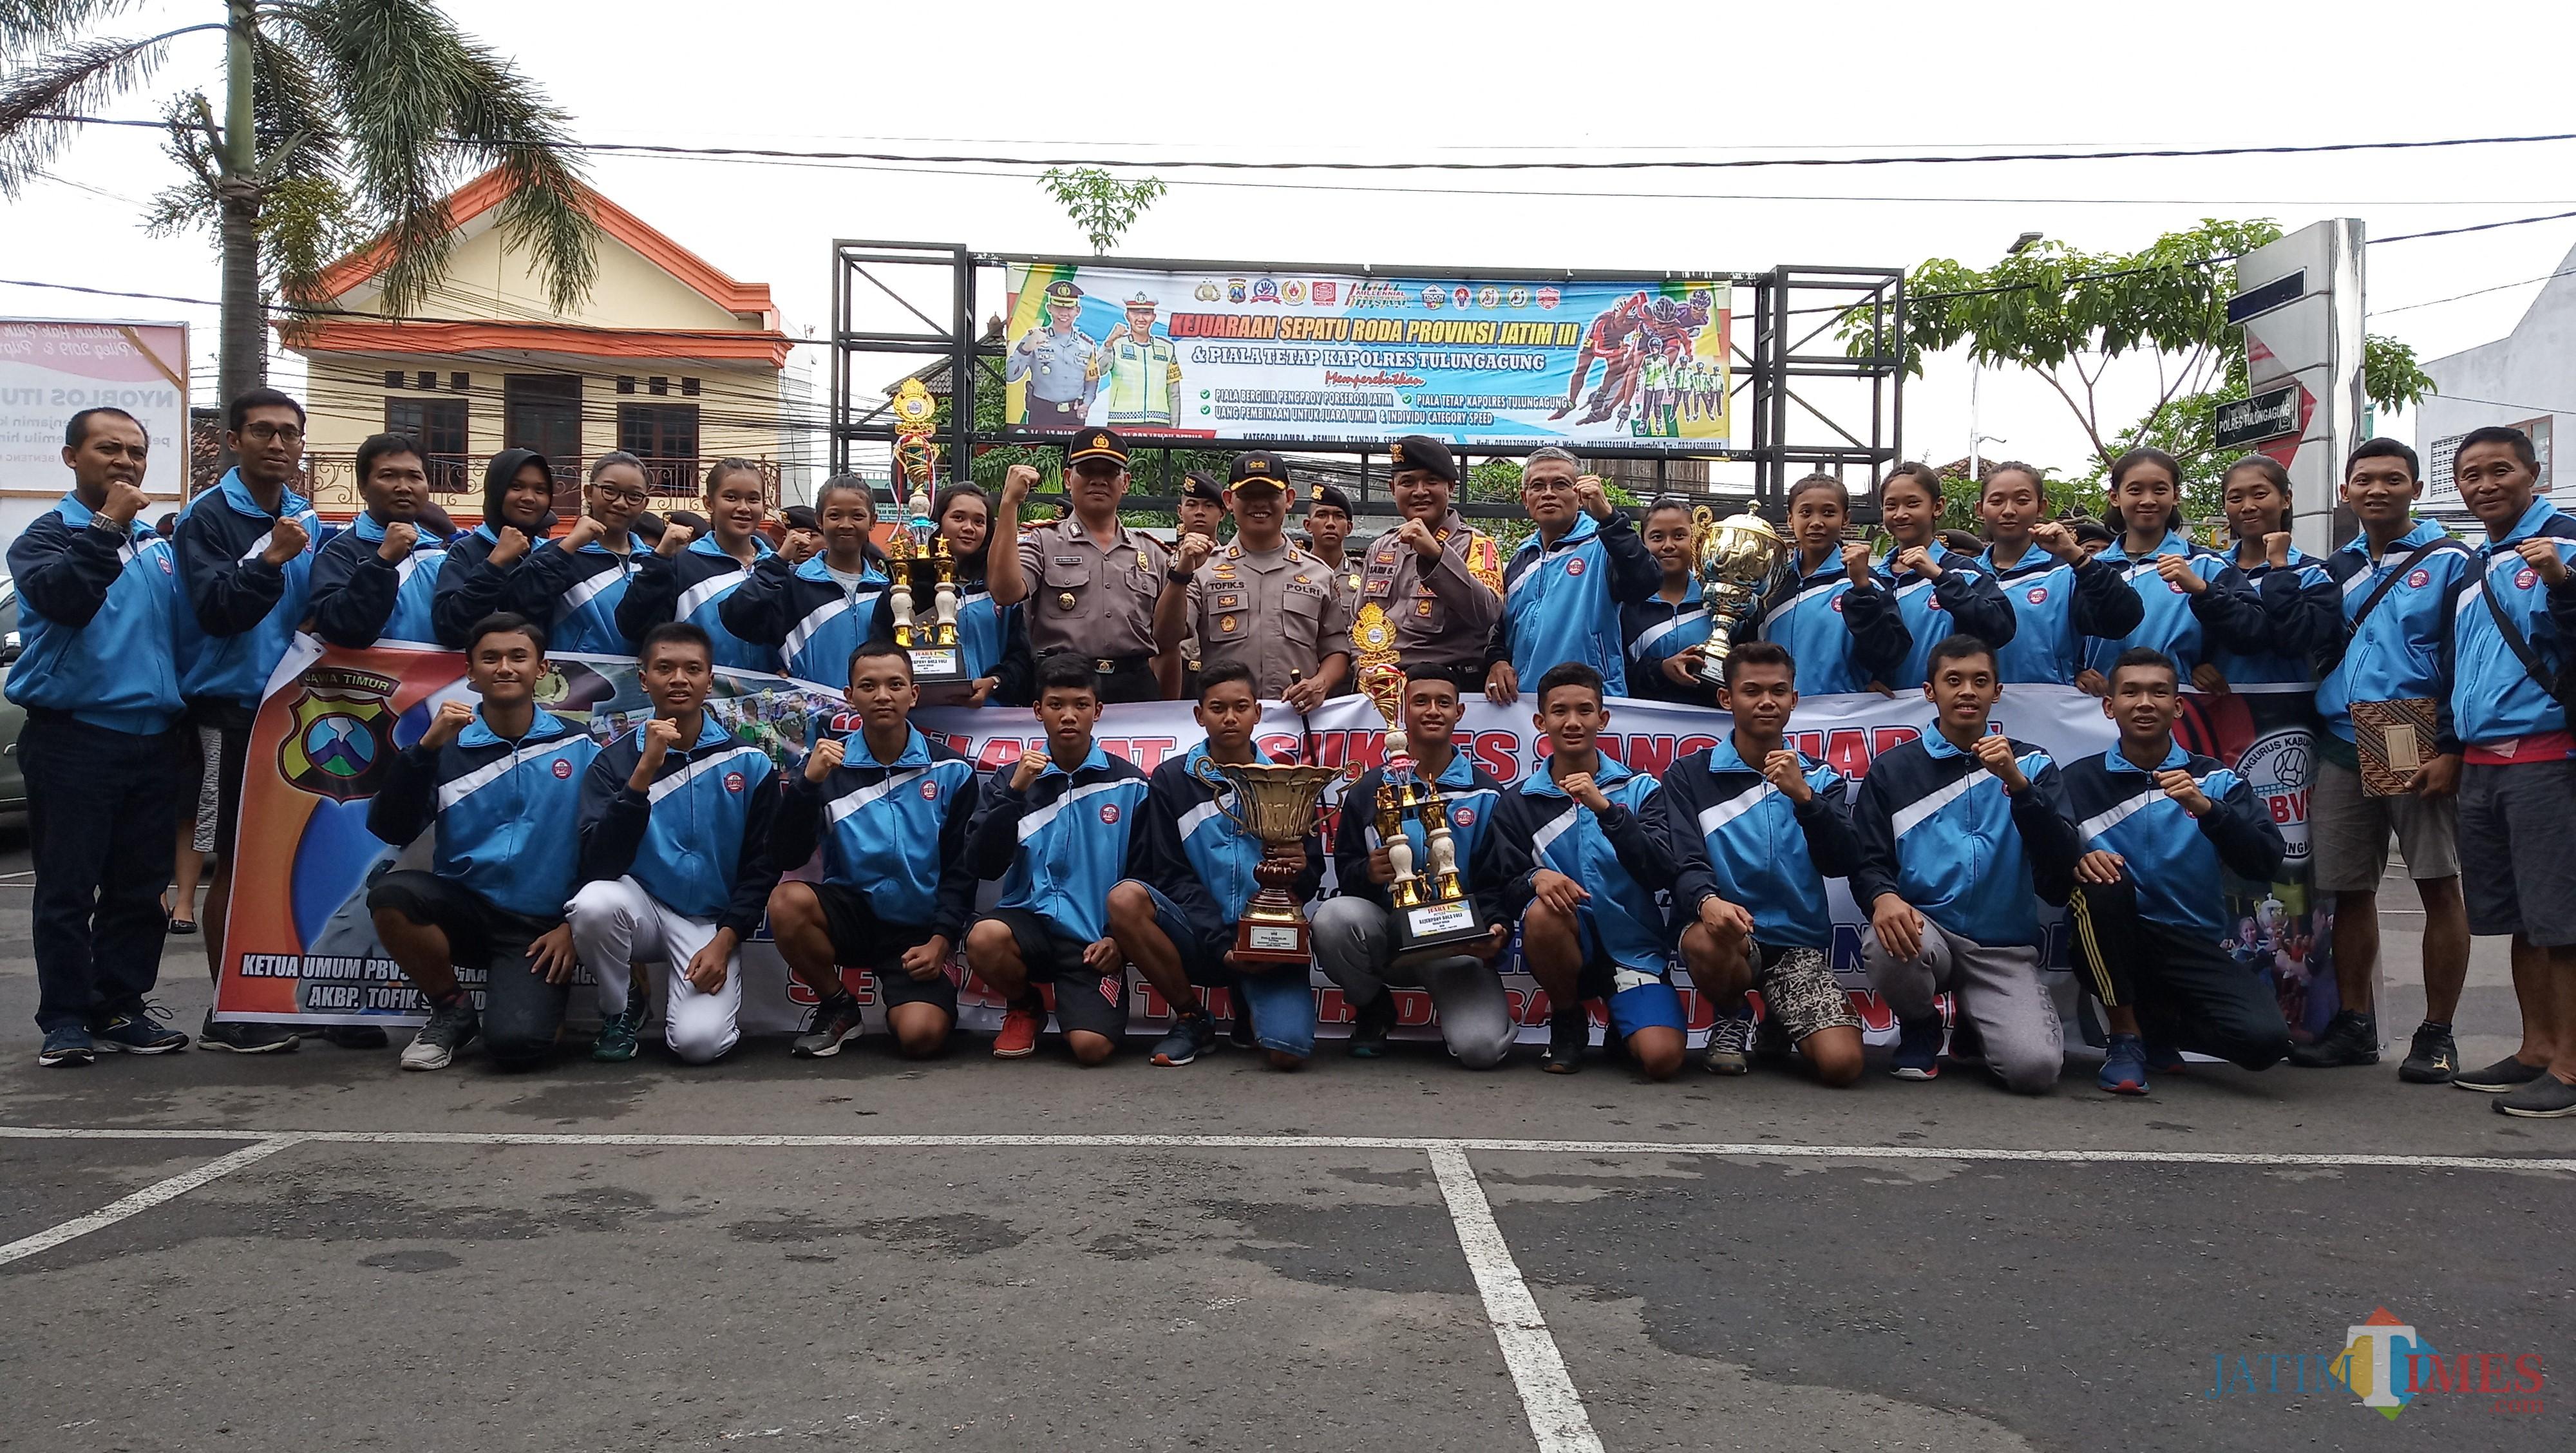 Kapolres berfoto bersama seluruh tim Volley Tulungagung (foto: Joko Pramono/Jatim Times)